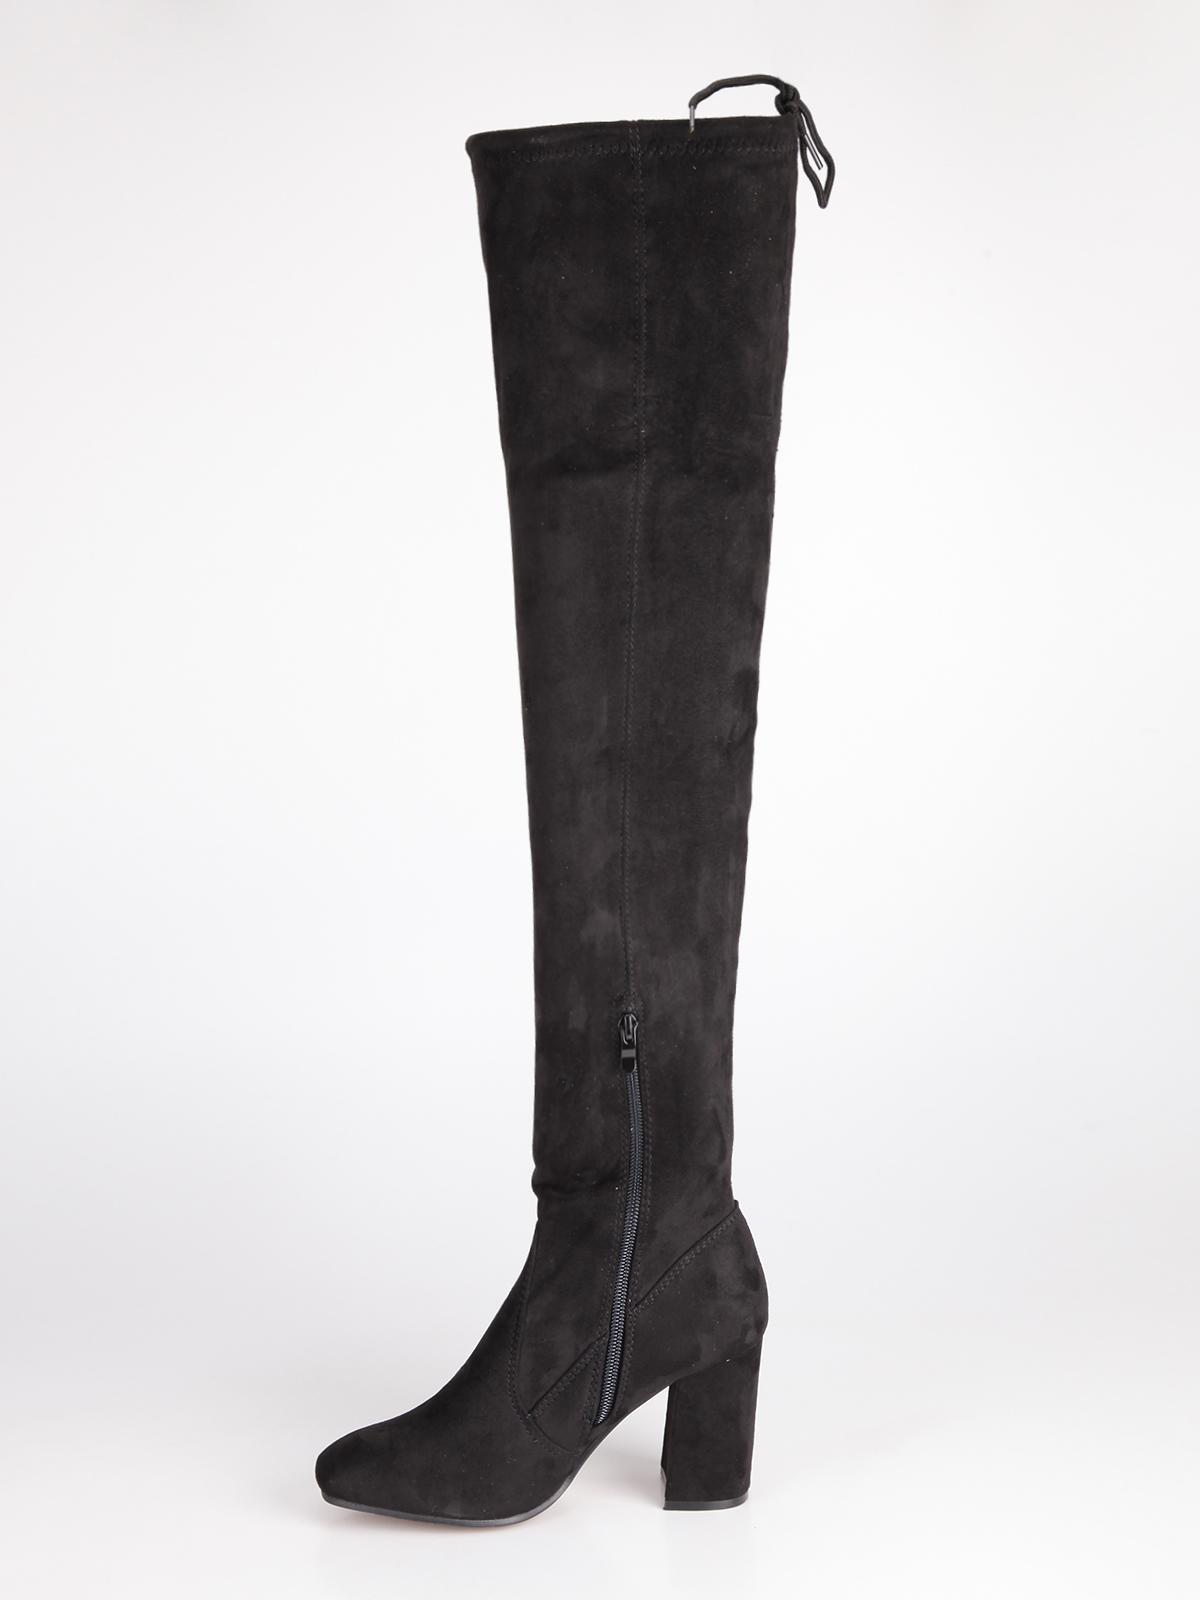 Stivali neri sopra il ginocchio super made | MecShopping